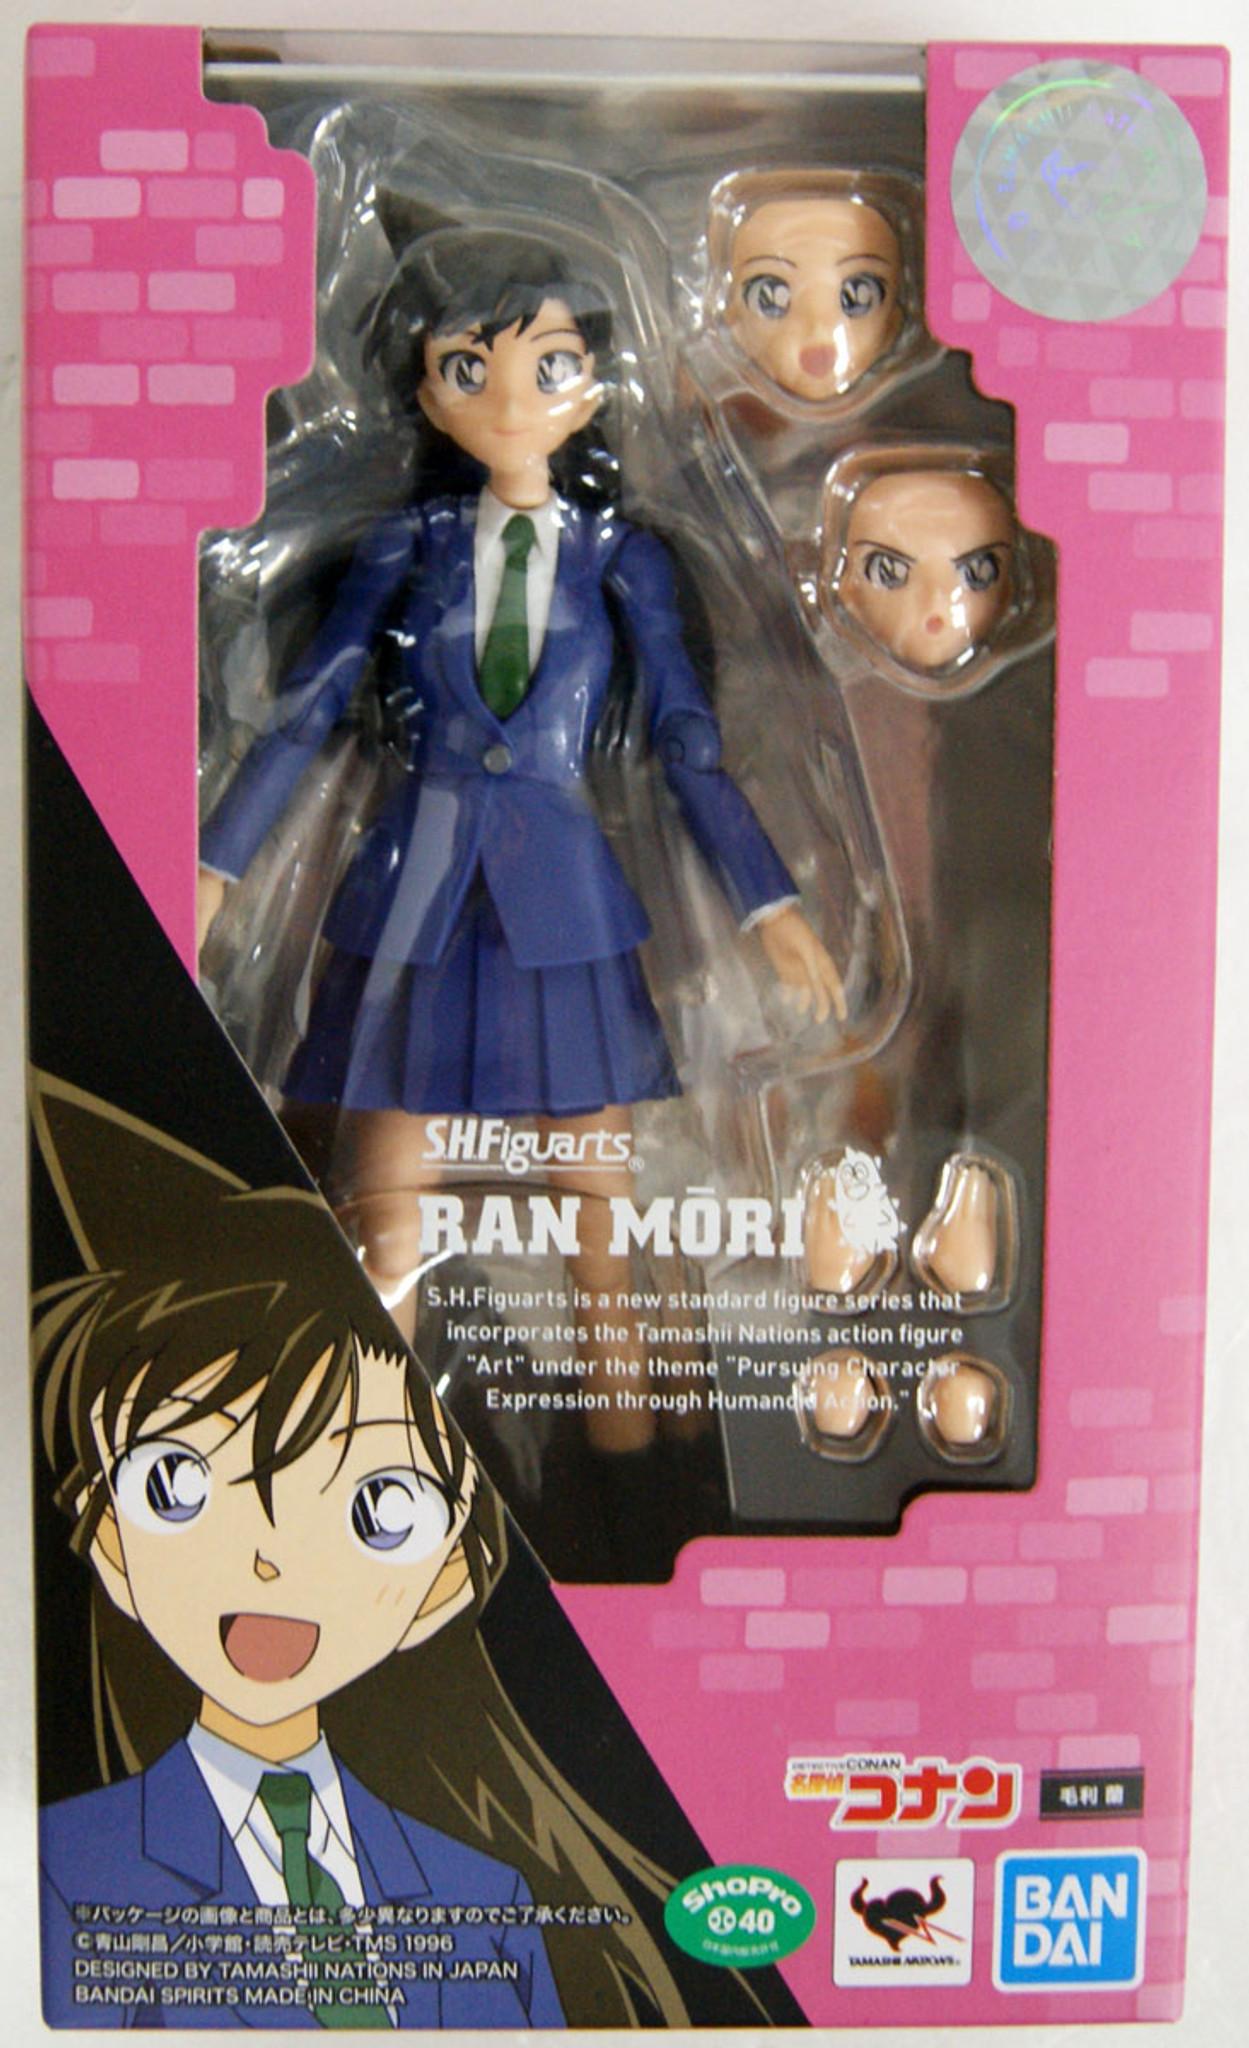 Bandai S H  Figuarts Detective Conan Ran Mori Figure